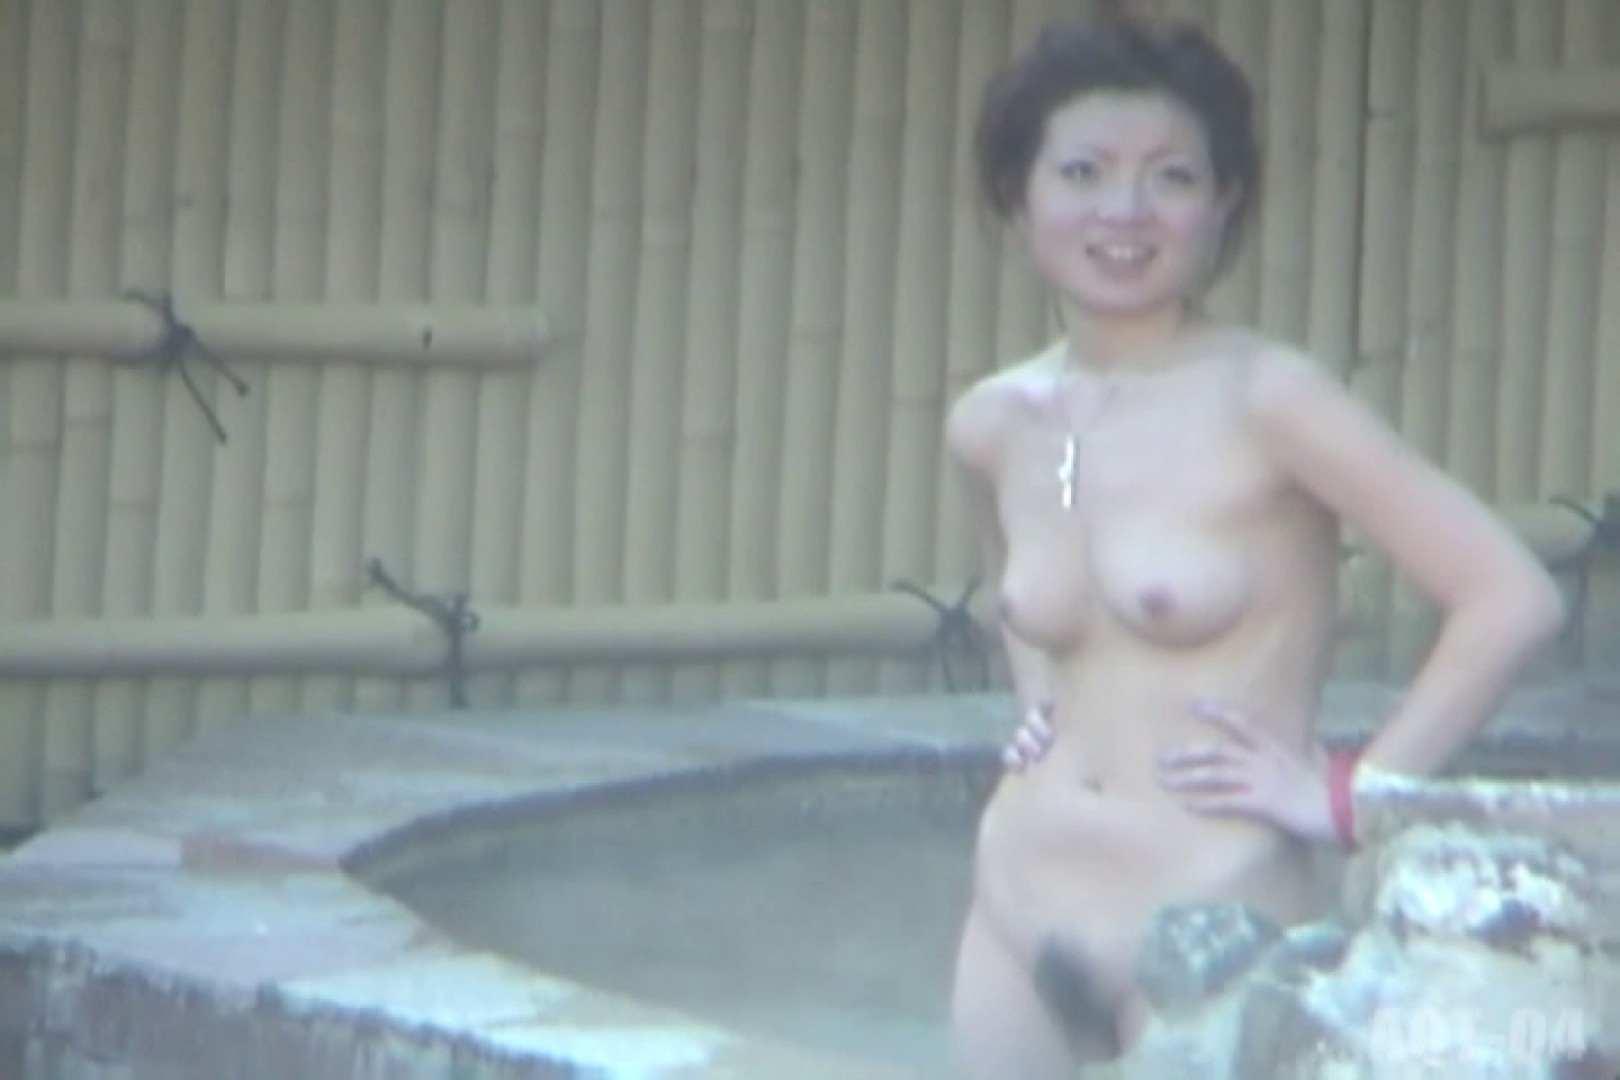 Aquaな露天風呂Vol.737 いやらしいOL オマンコ無修正動画無料 54連発 27